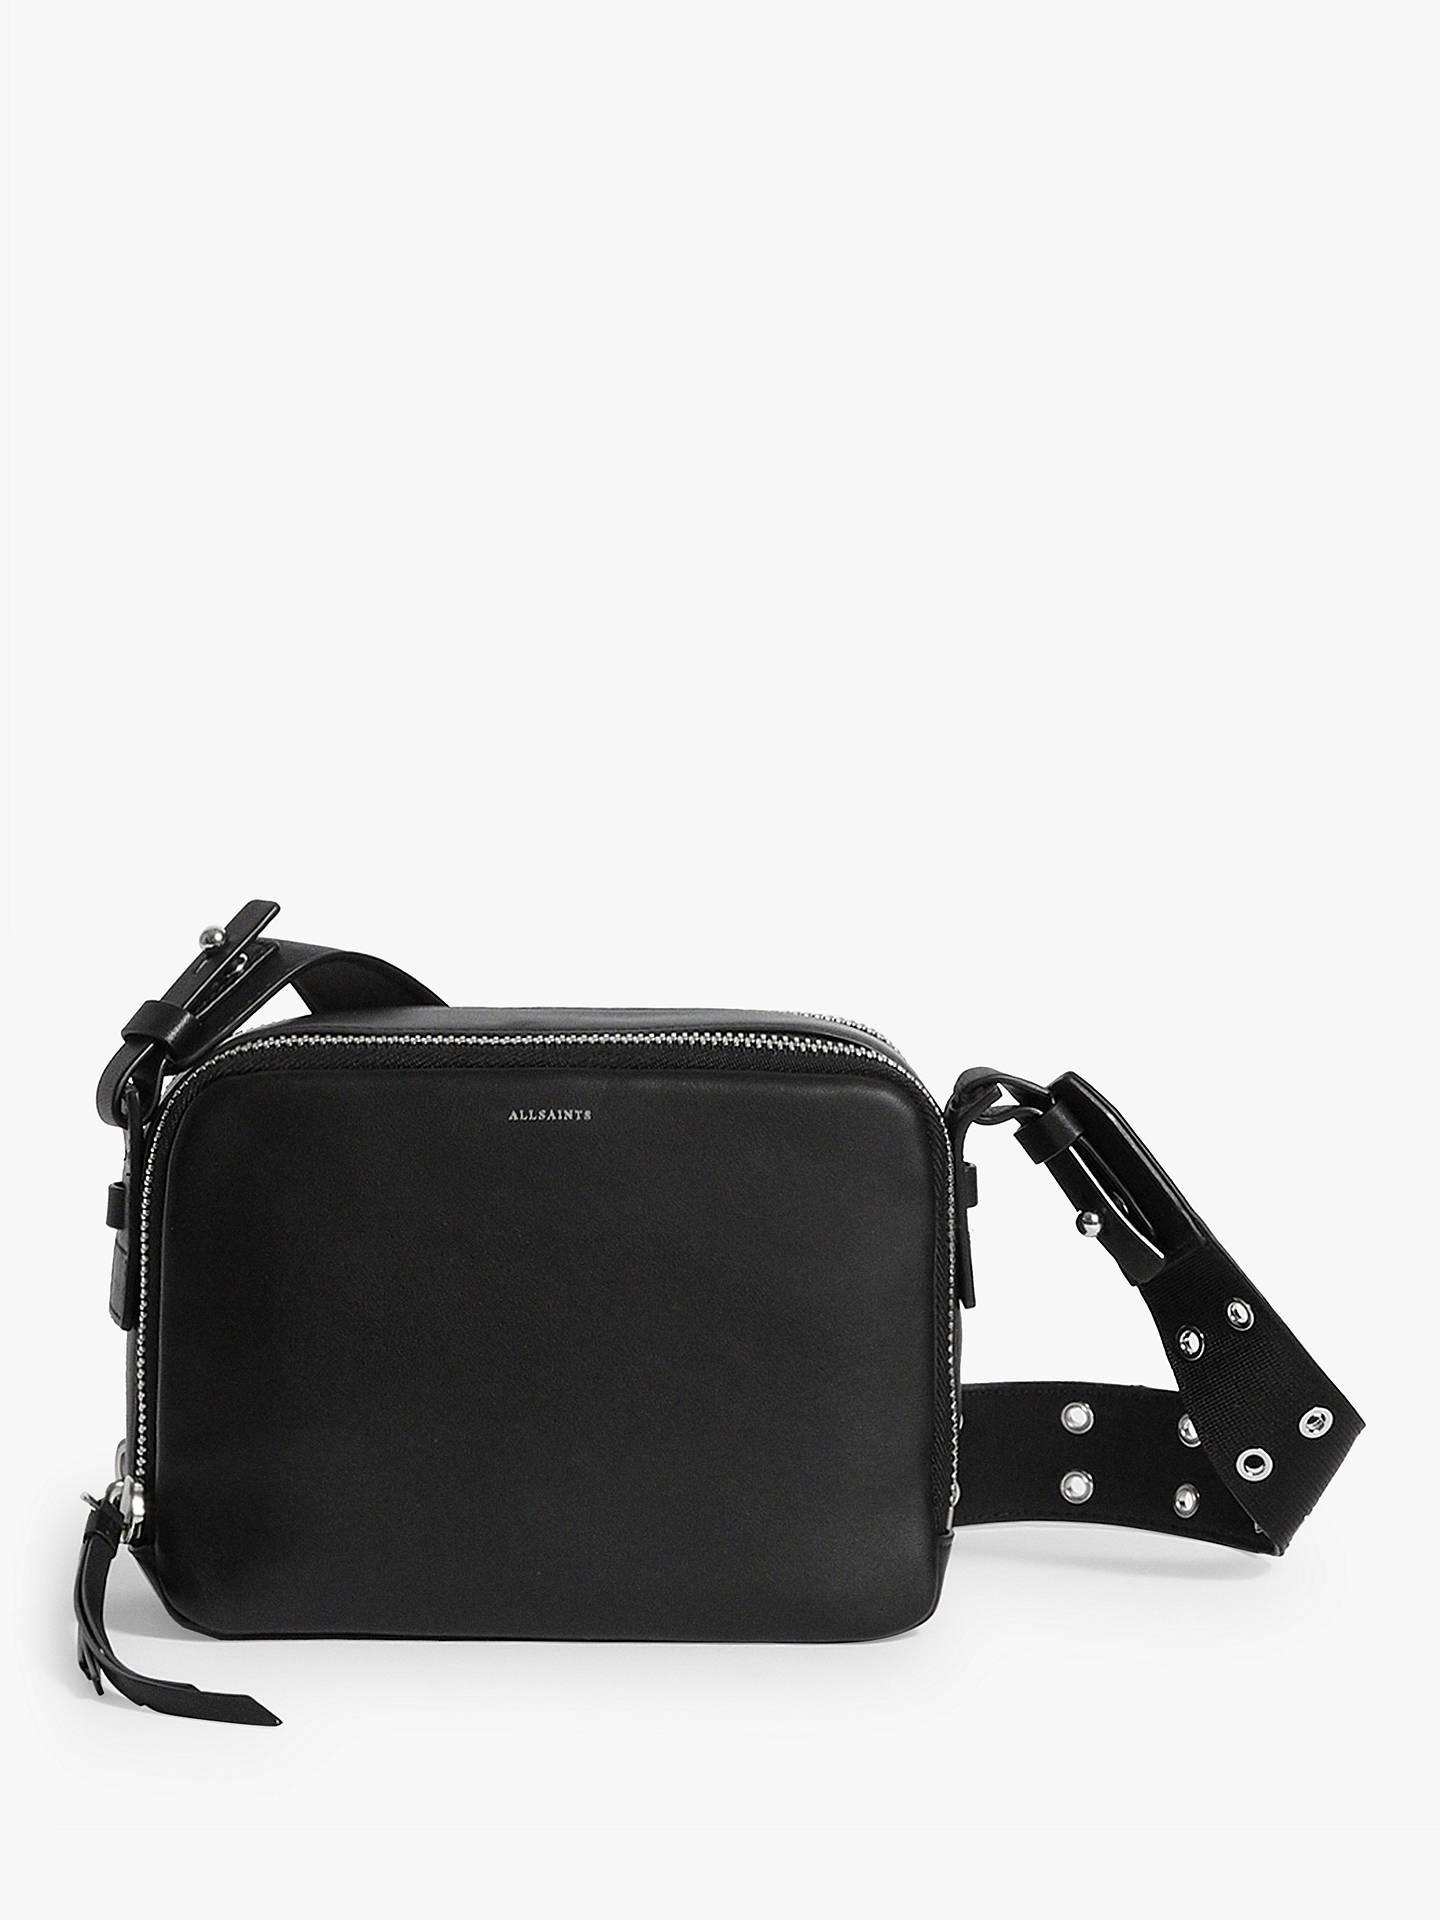 Allsaints Sid Leather Cross Body Bag Black Online At Johnlewis